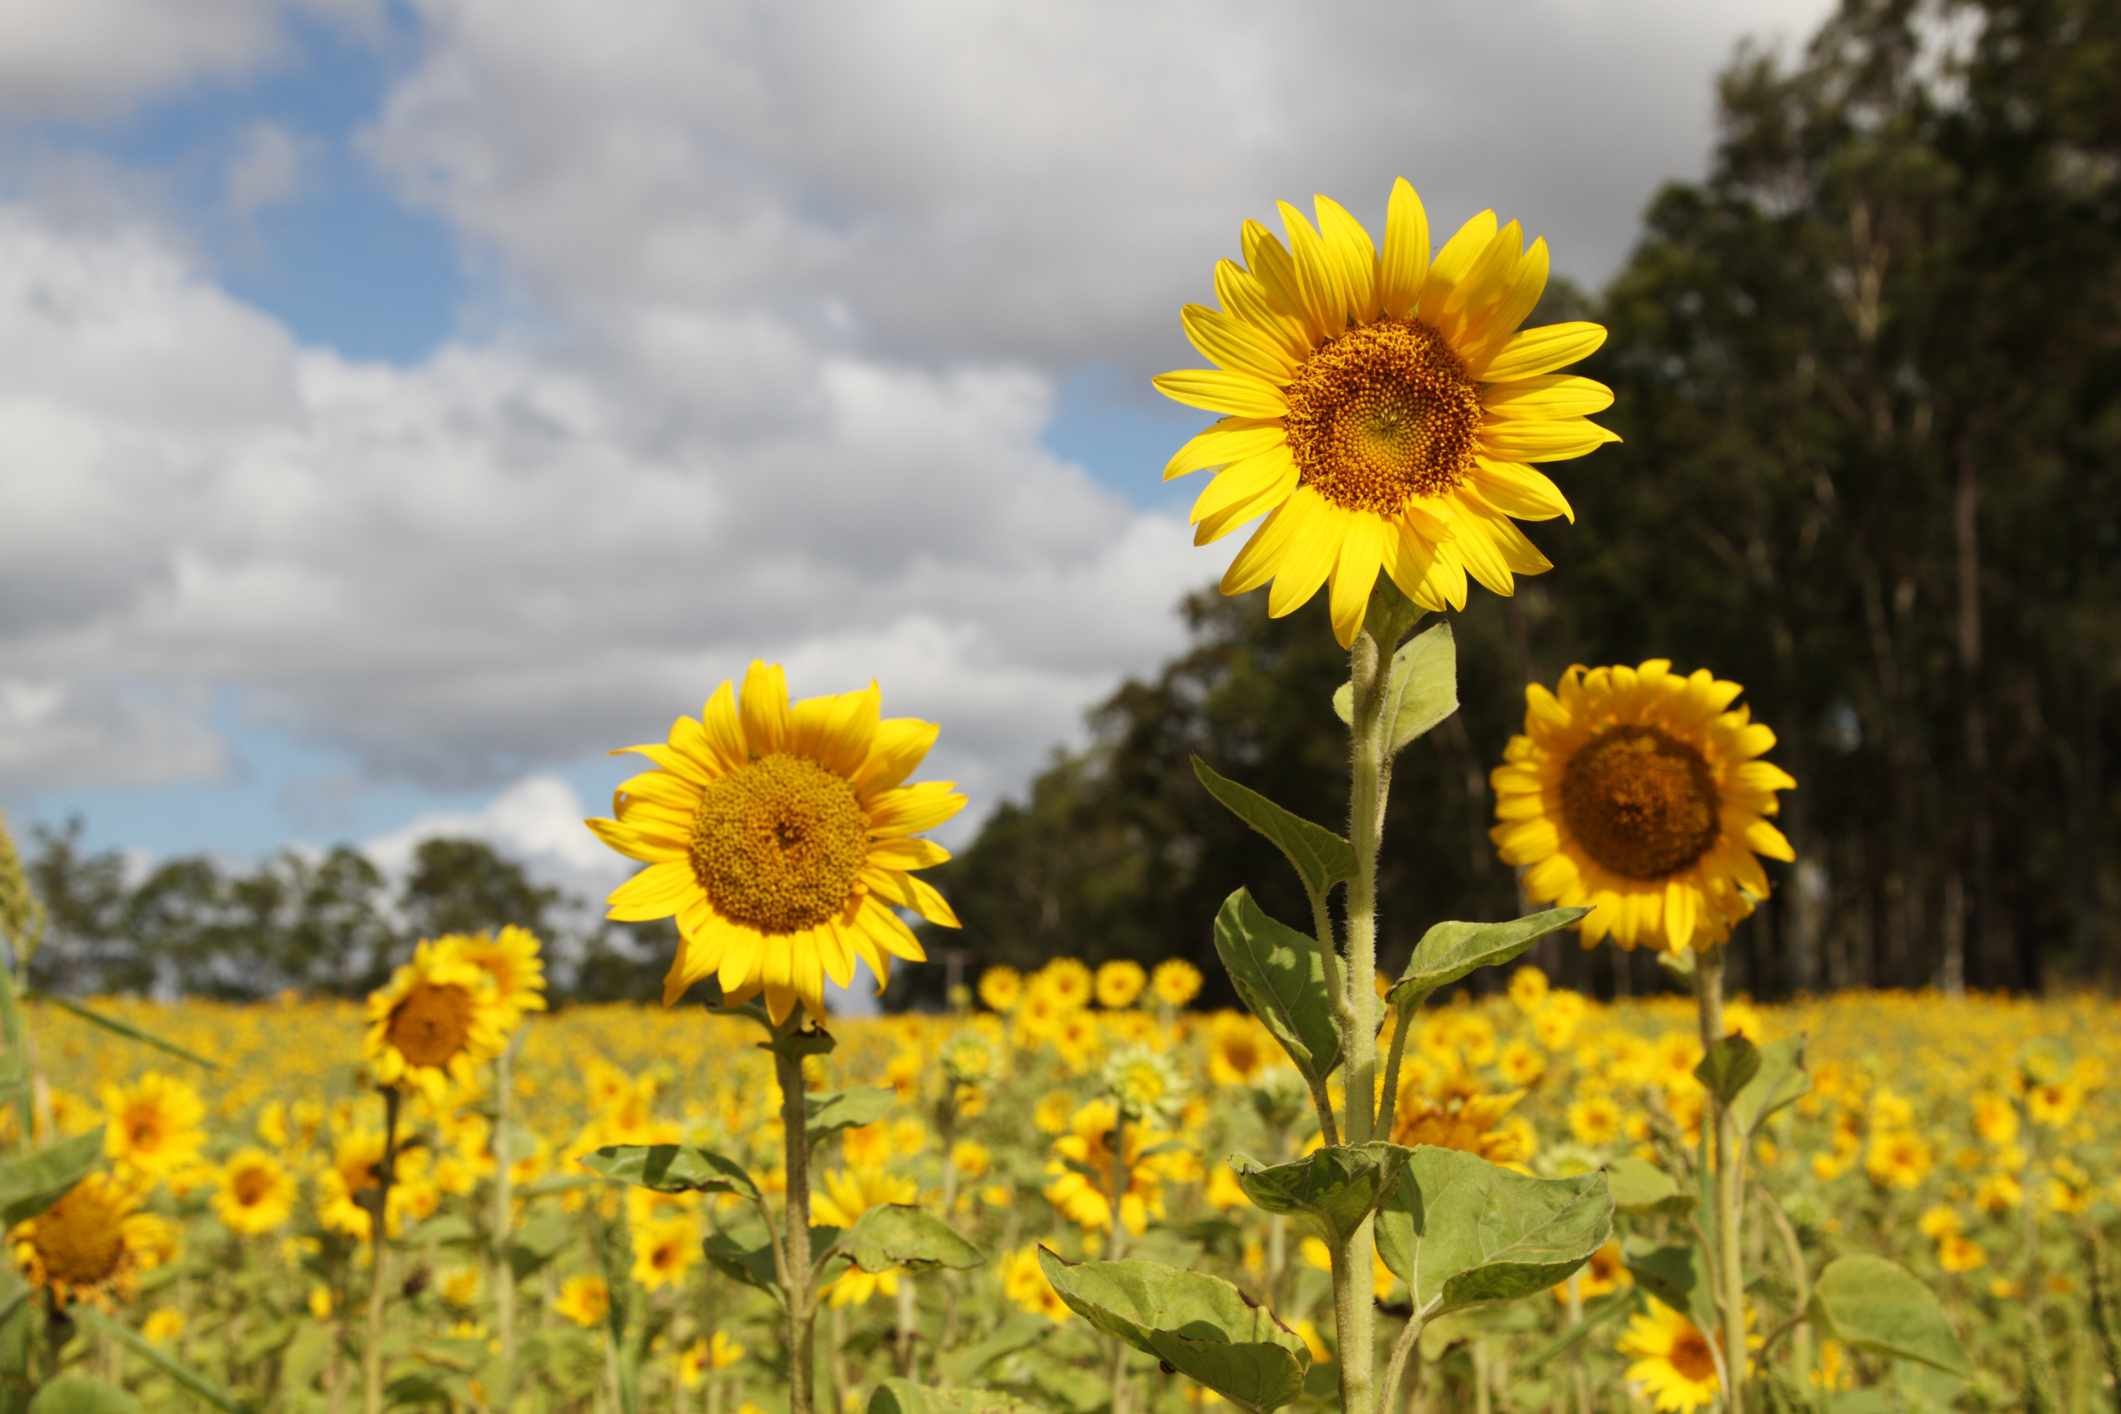 Sunflower field with focus on three tall sunflowers